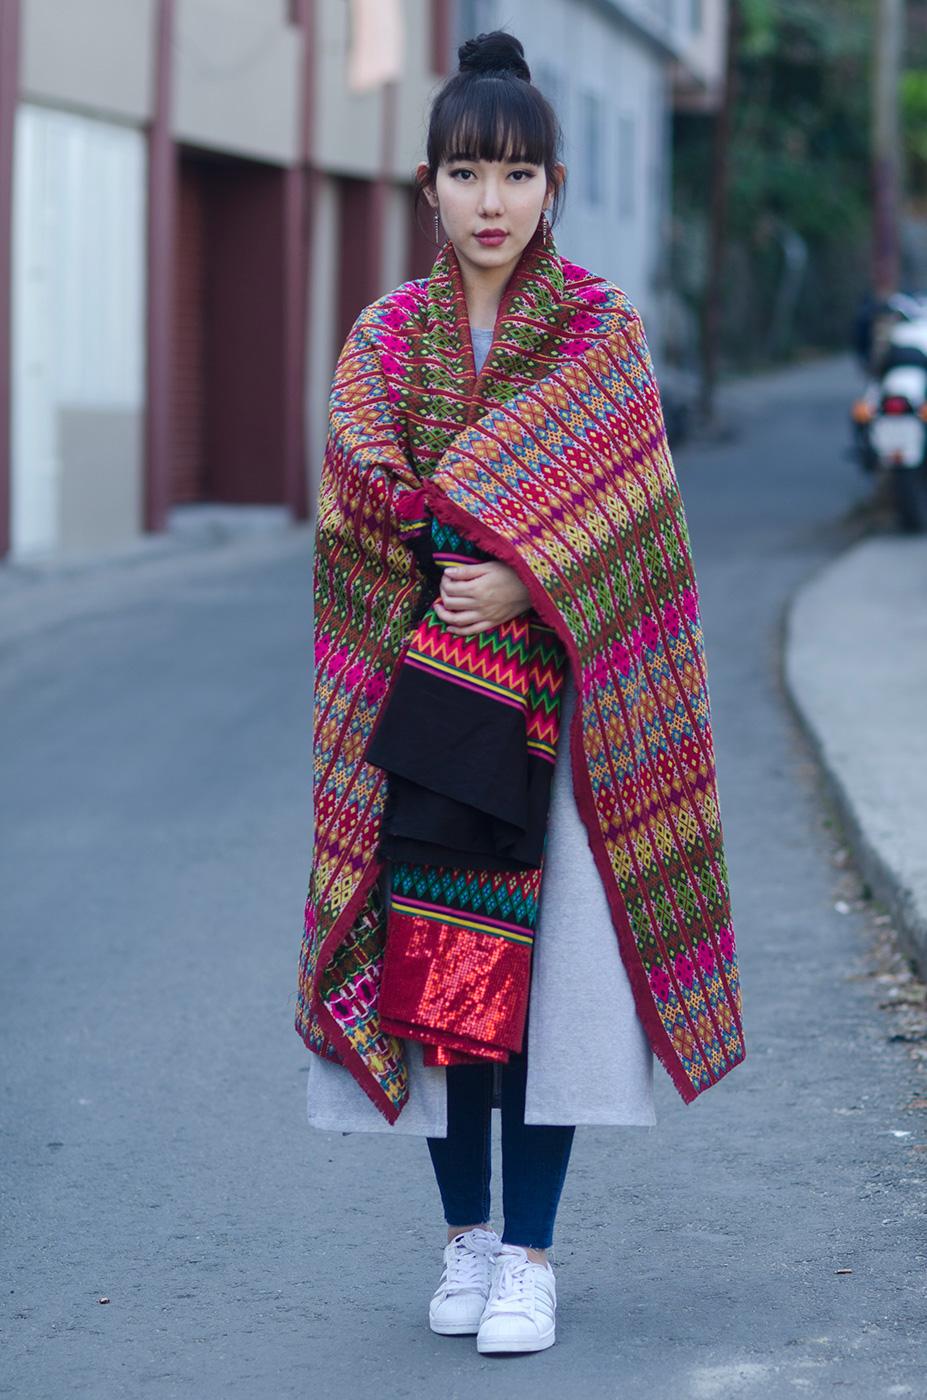 street style aizawl mizoram fashion northeast india